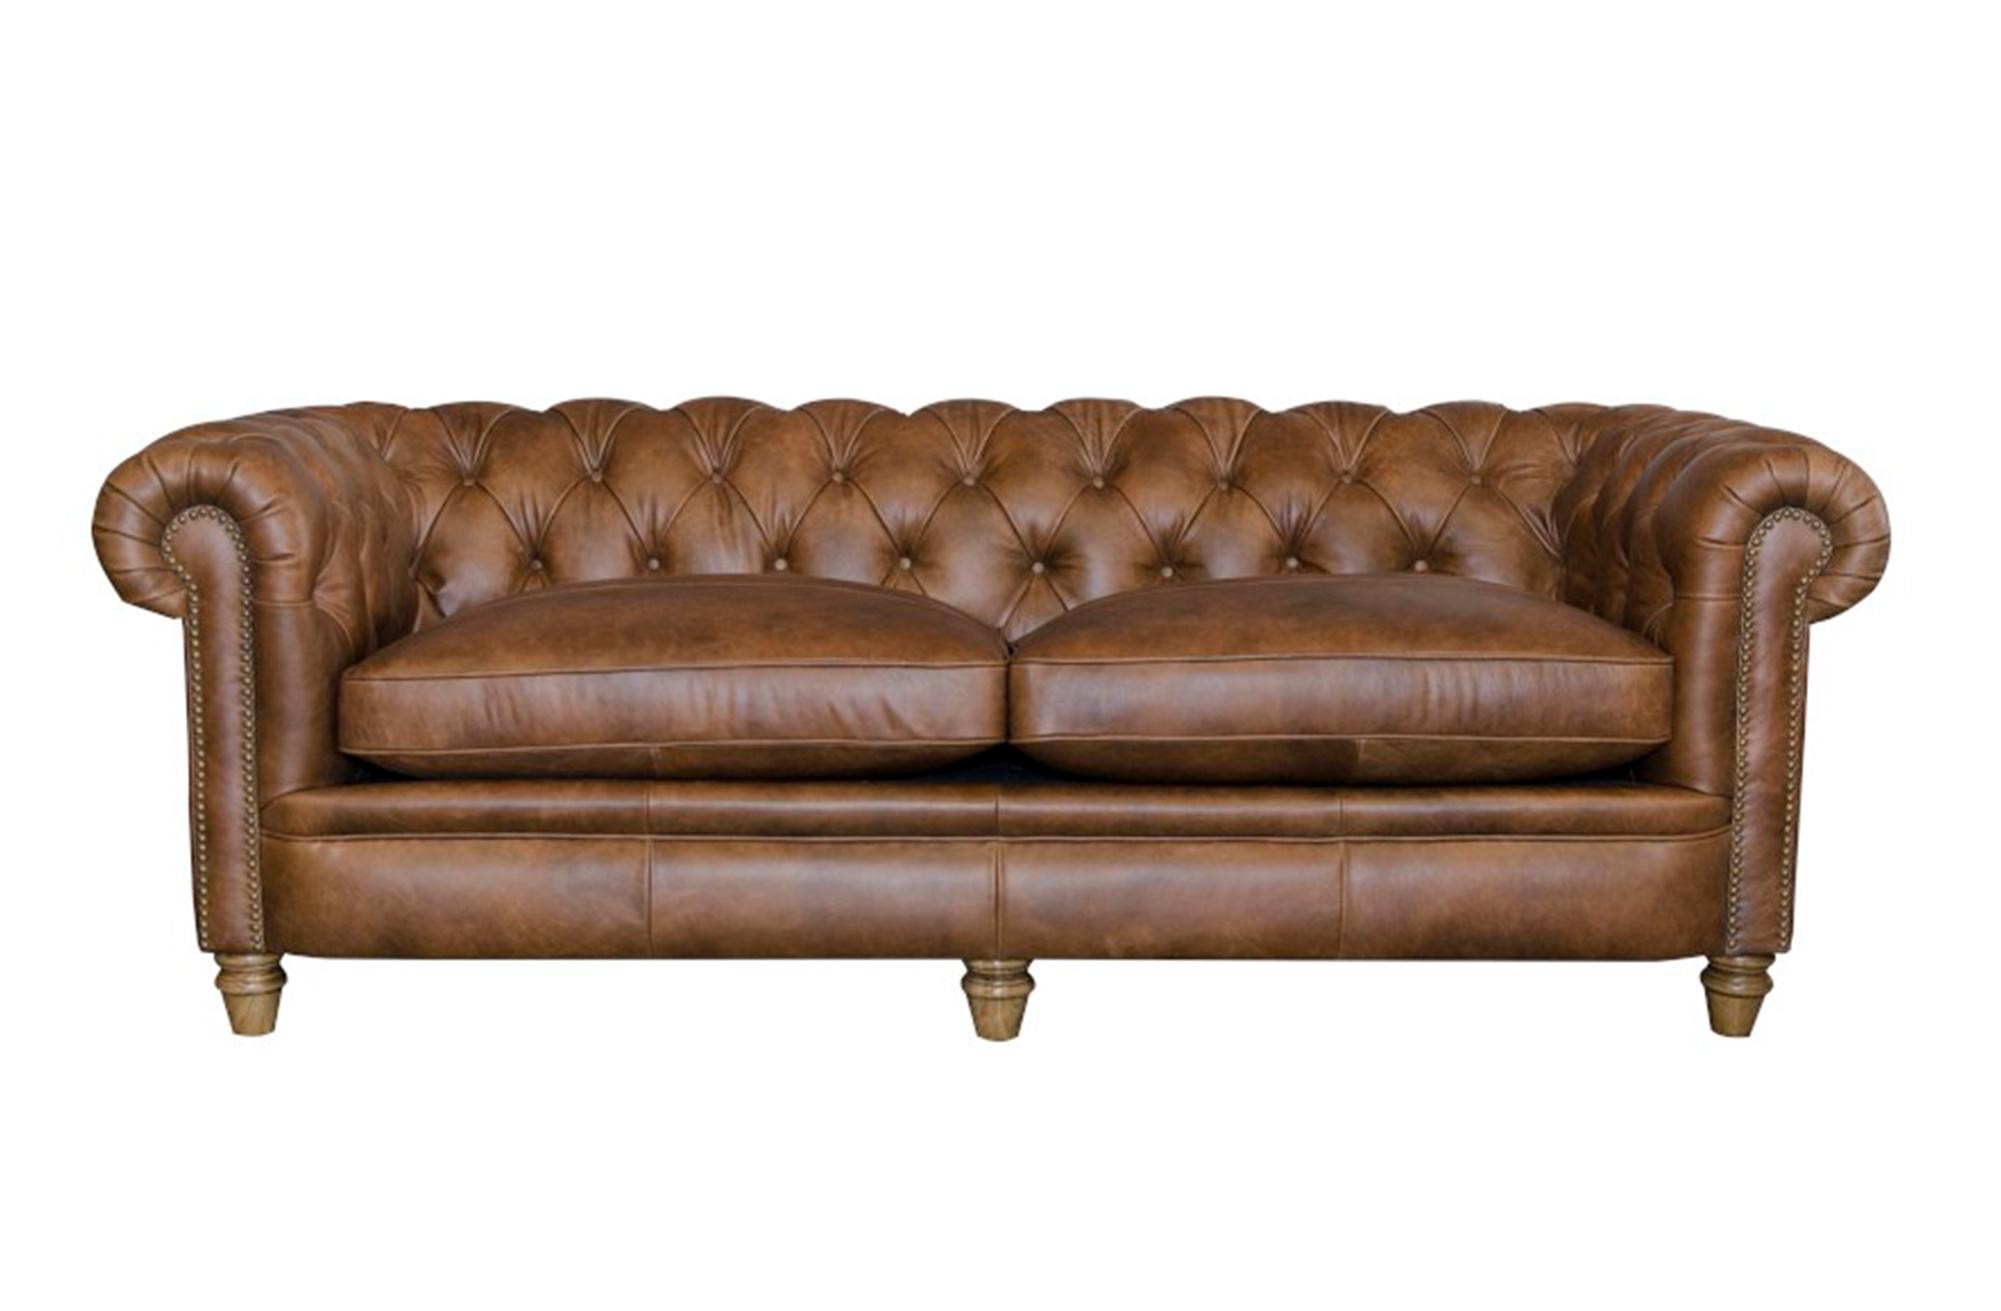 Incredible Abraham Junior Grand Sofa Alexander And James Pdpeps Interior Chair Design Pdpepsorg